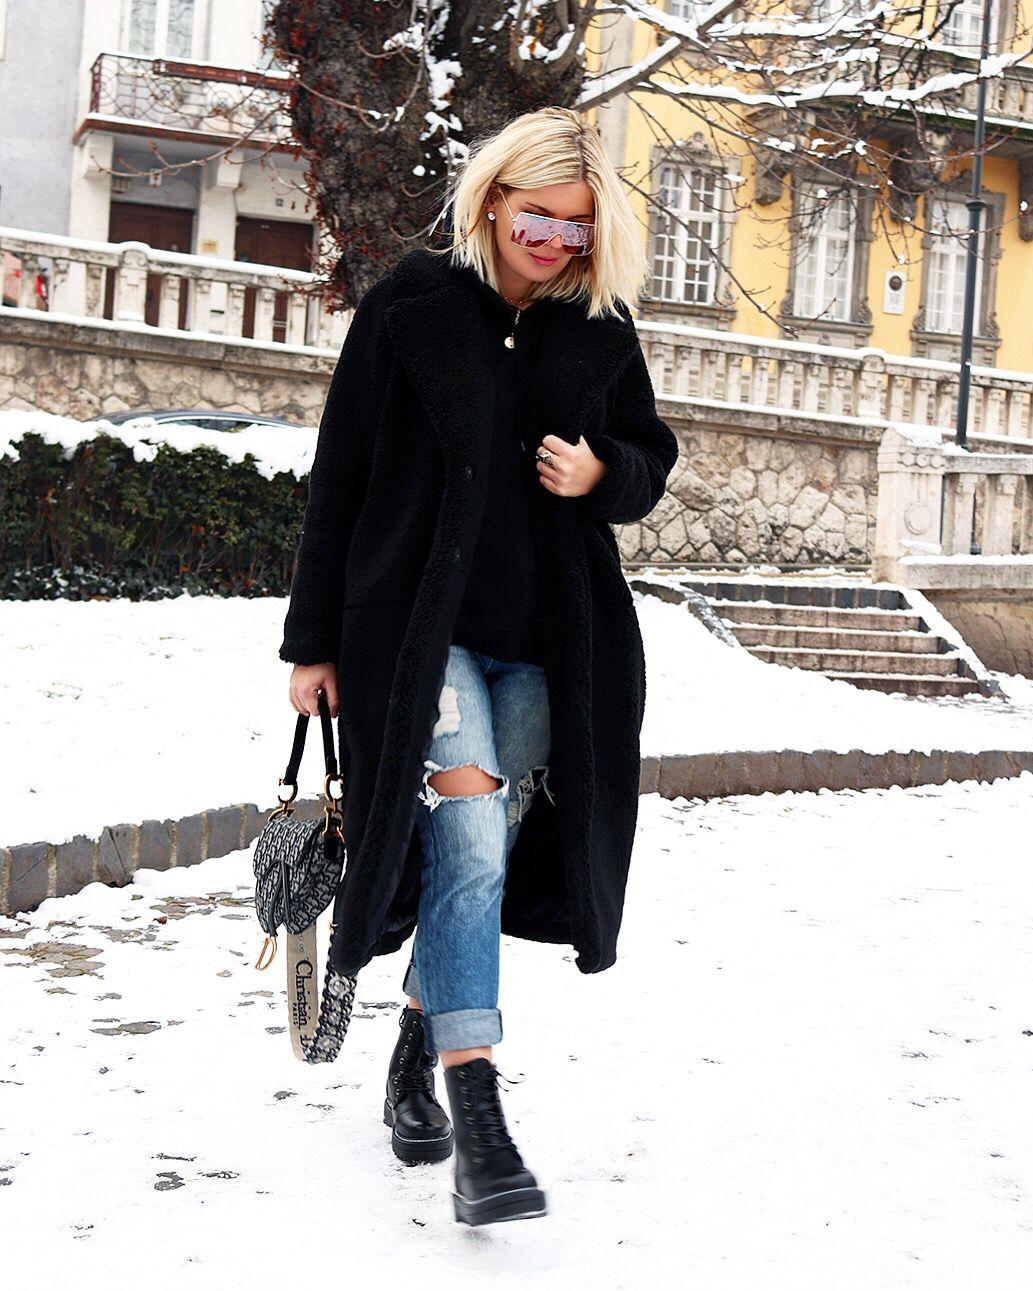 Black Teddy Coat Black Teddy Coat Winter Coat Outfits Fur Coat Street Style [ 1291 x 1033 Pixel ]